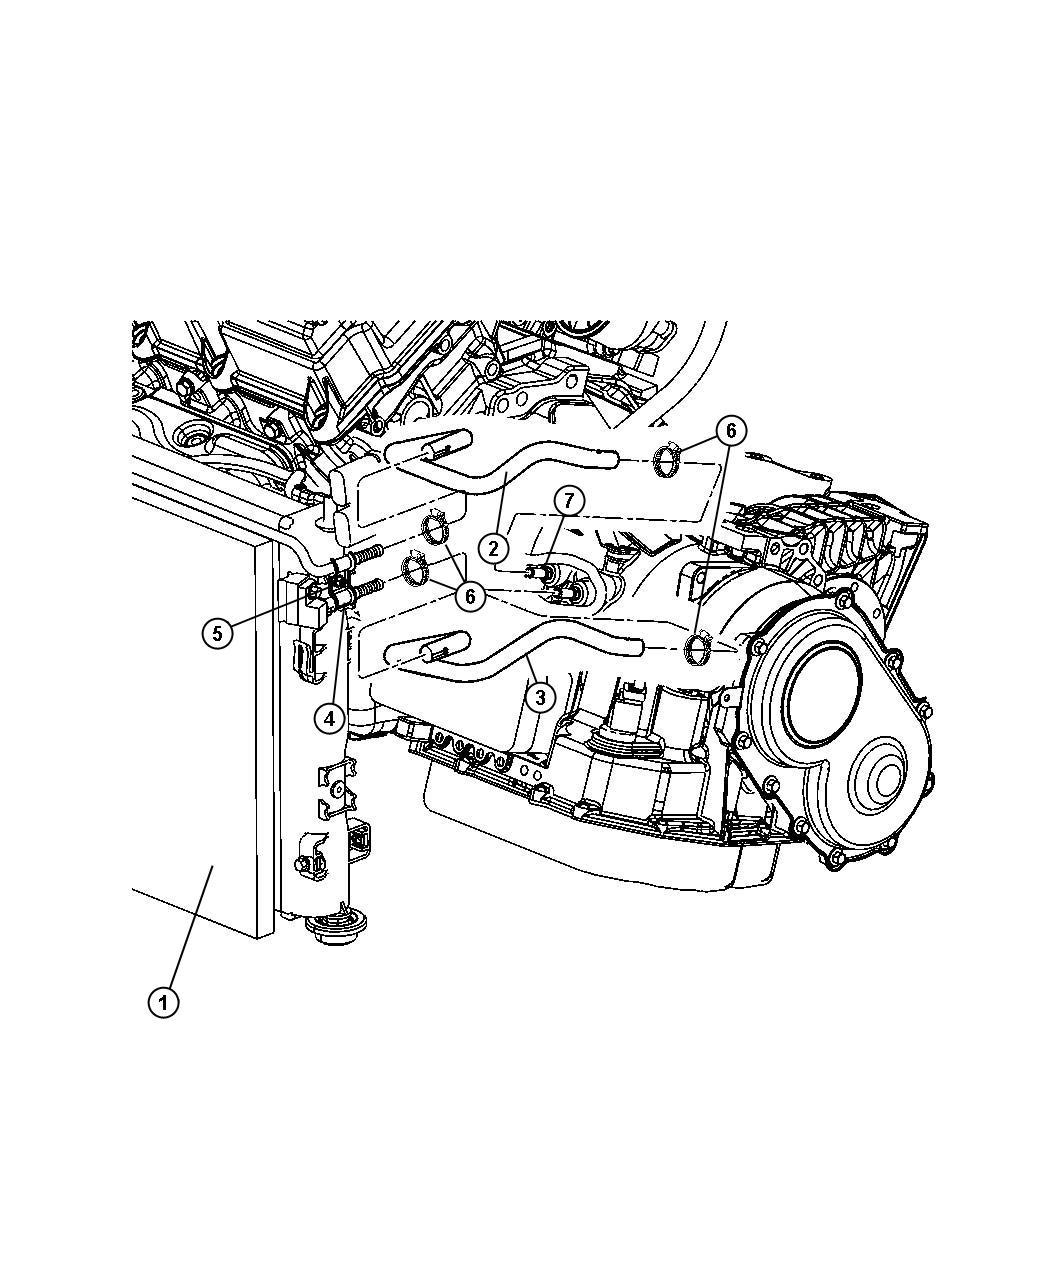 Chrysler Sebring Cooler Cooler Kit Used For